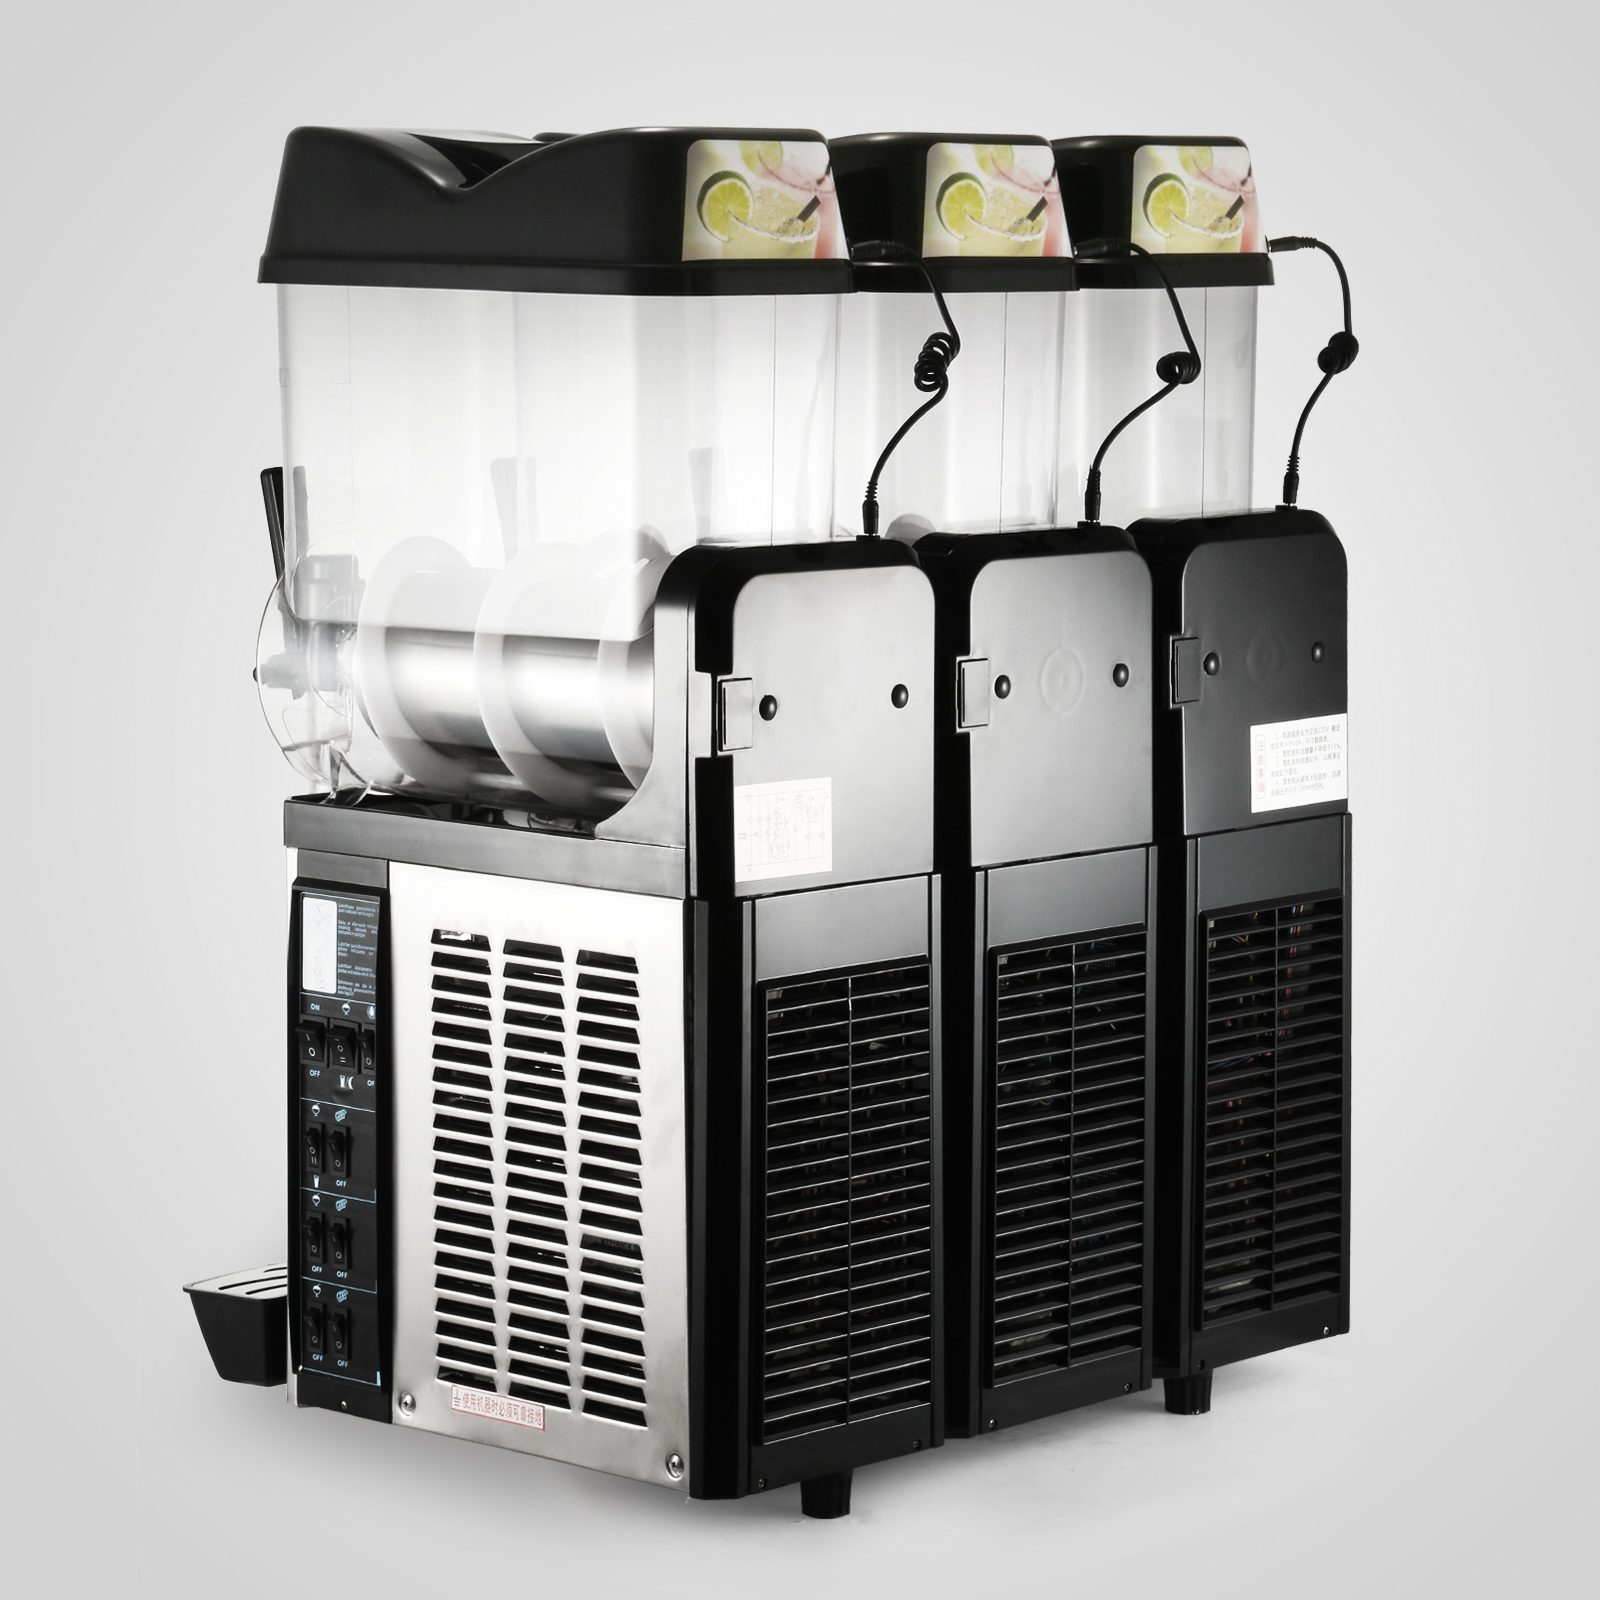 3 Tanks 36L Commercial Frozen Drink Slush Slushy Machine Slush Maker Margarita